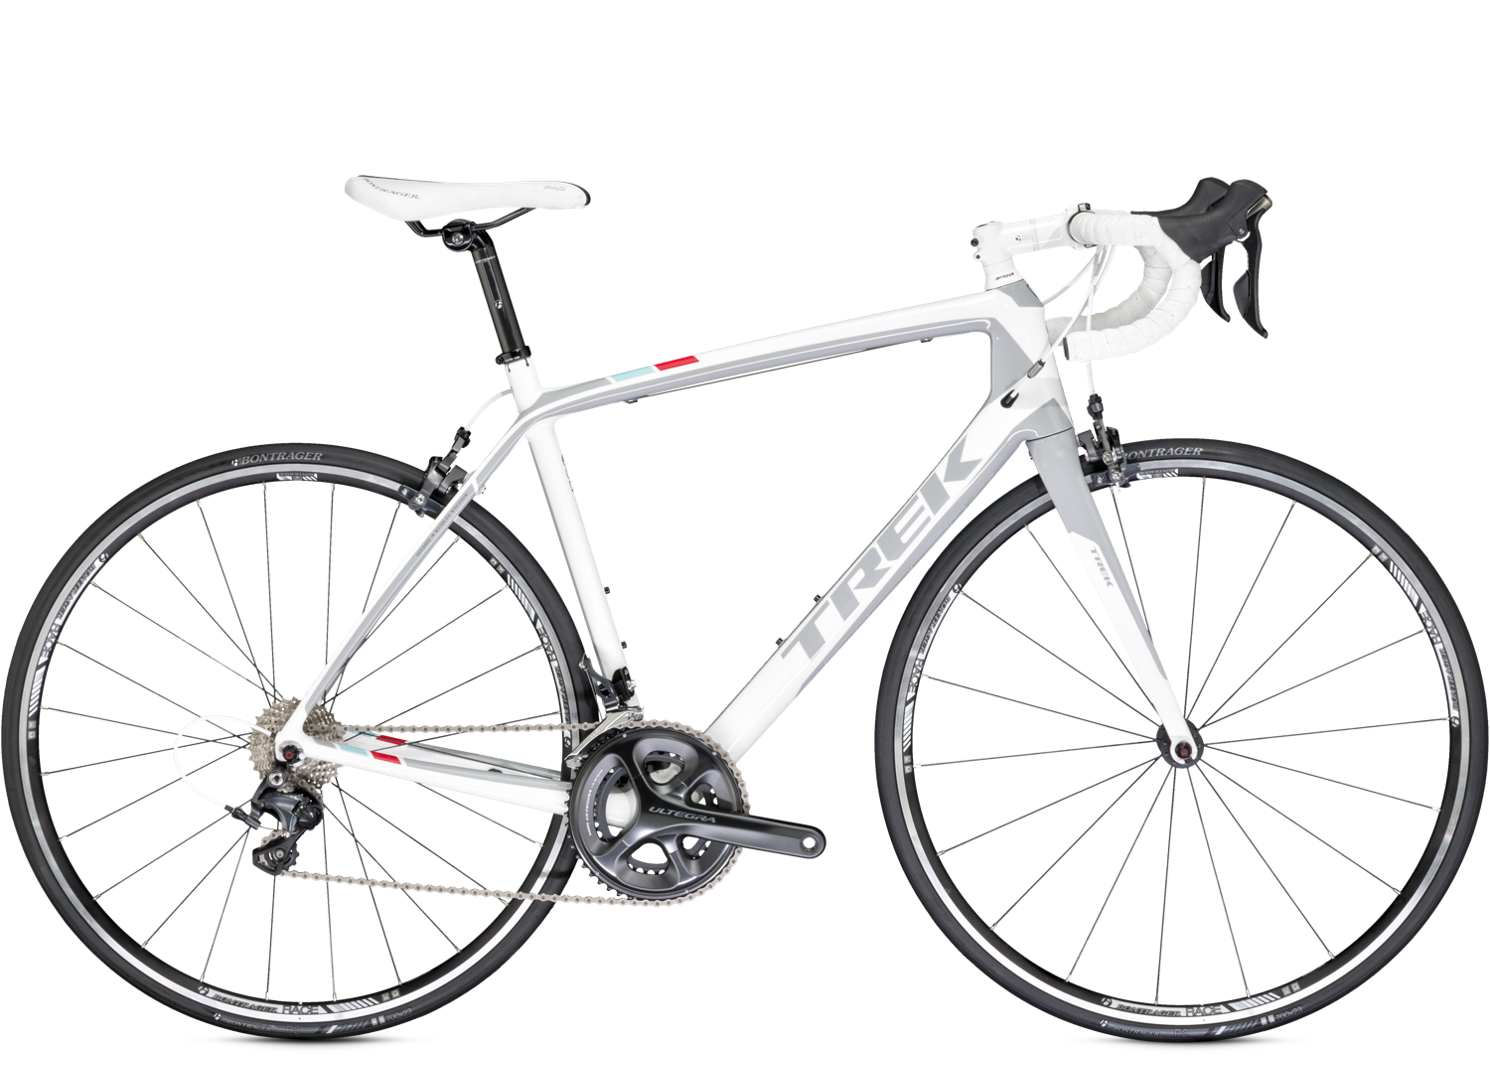 2014 Madone 4 7 H2 Compact - Bike Archive - Trek Bicycle